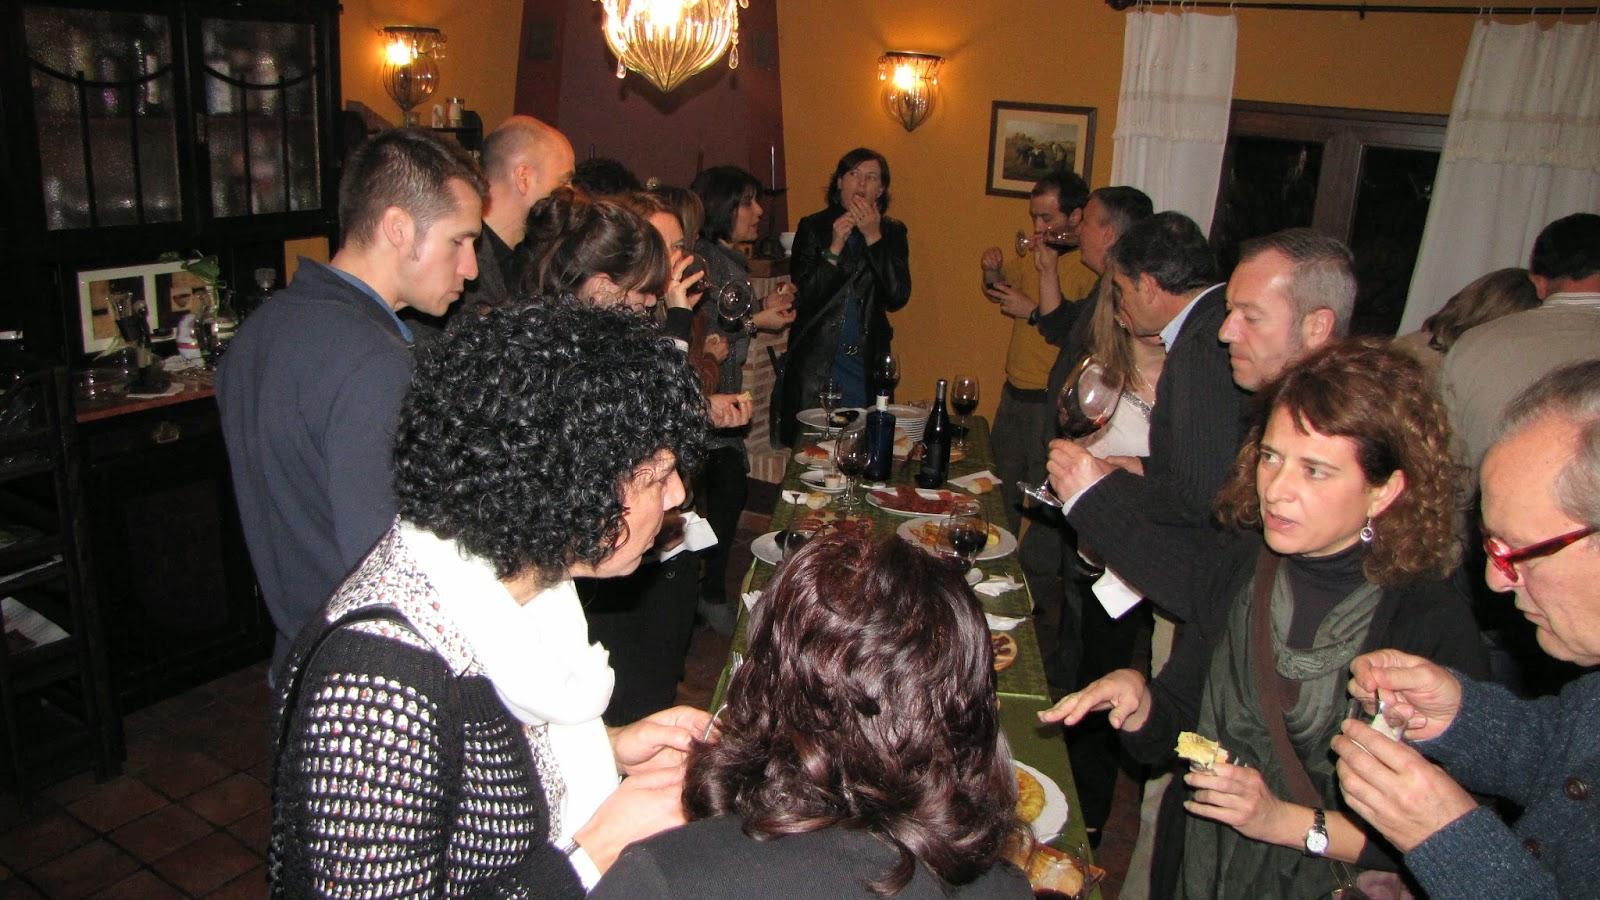 cata de vinos con bodega calzadilla en hospederia ballesteros, cuenca